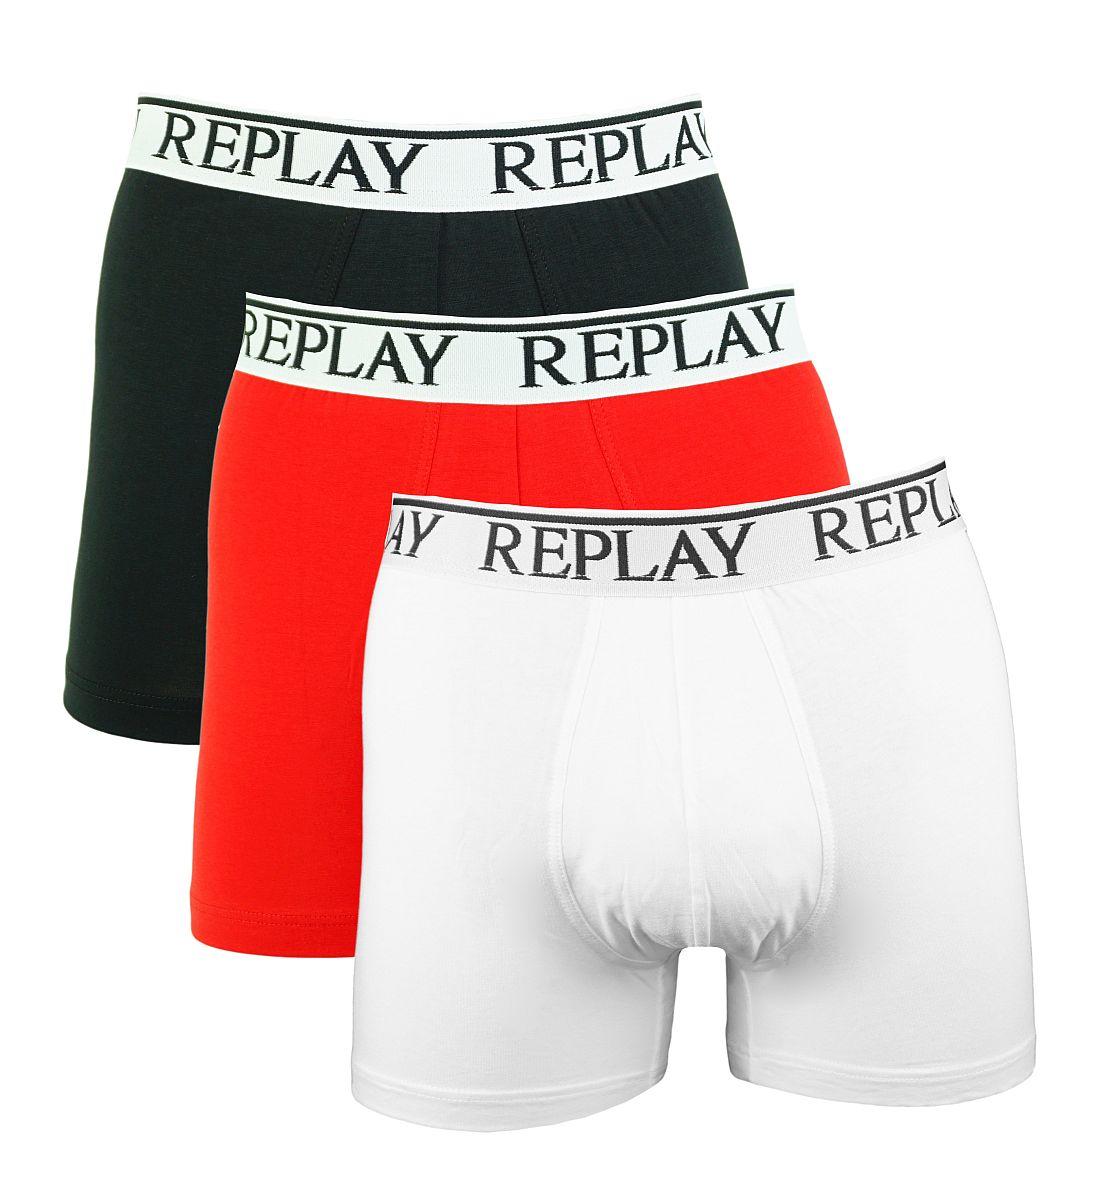 Replay 3er Pack Shorts Boxershorts M605001 E57 schwarz, rot, weiss W18-RY1